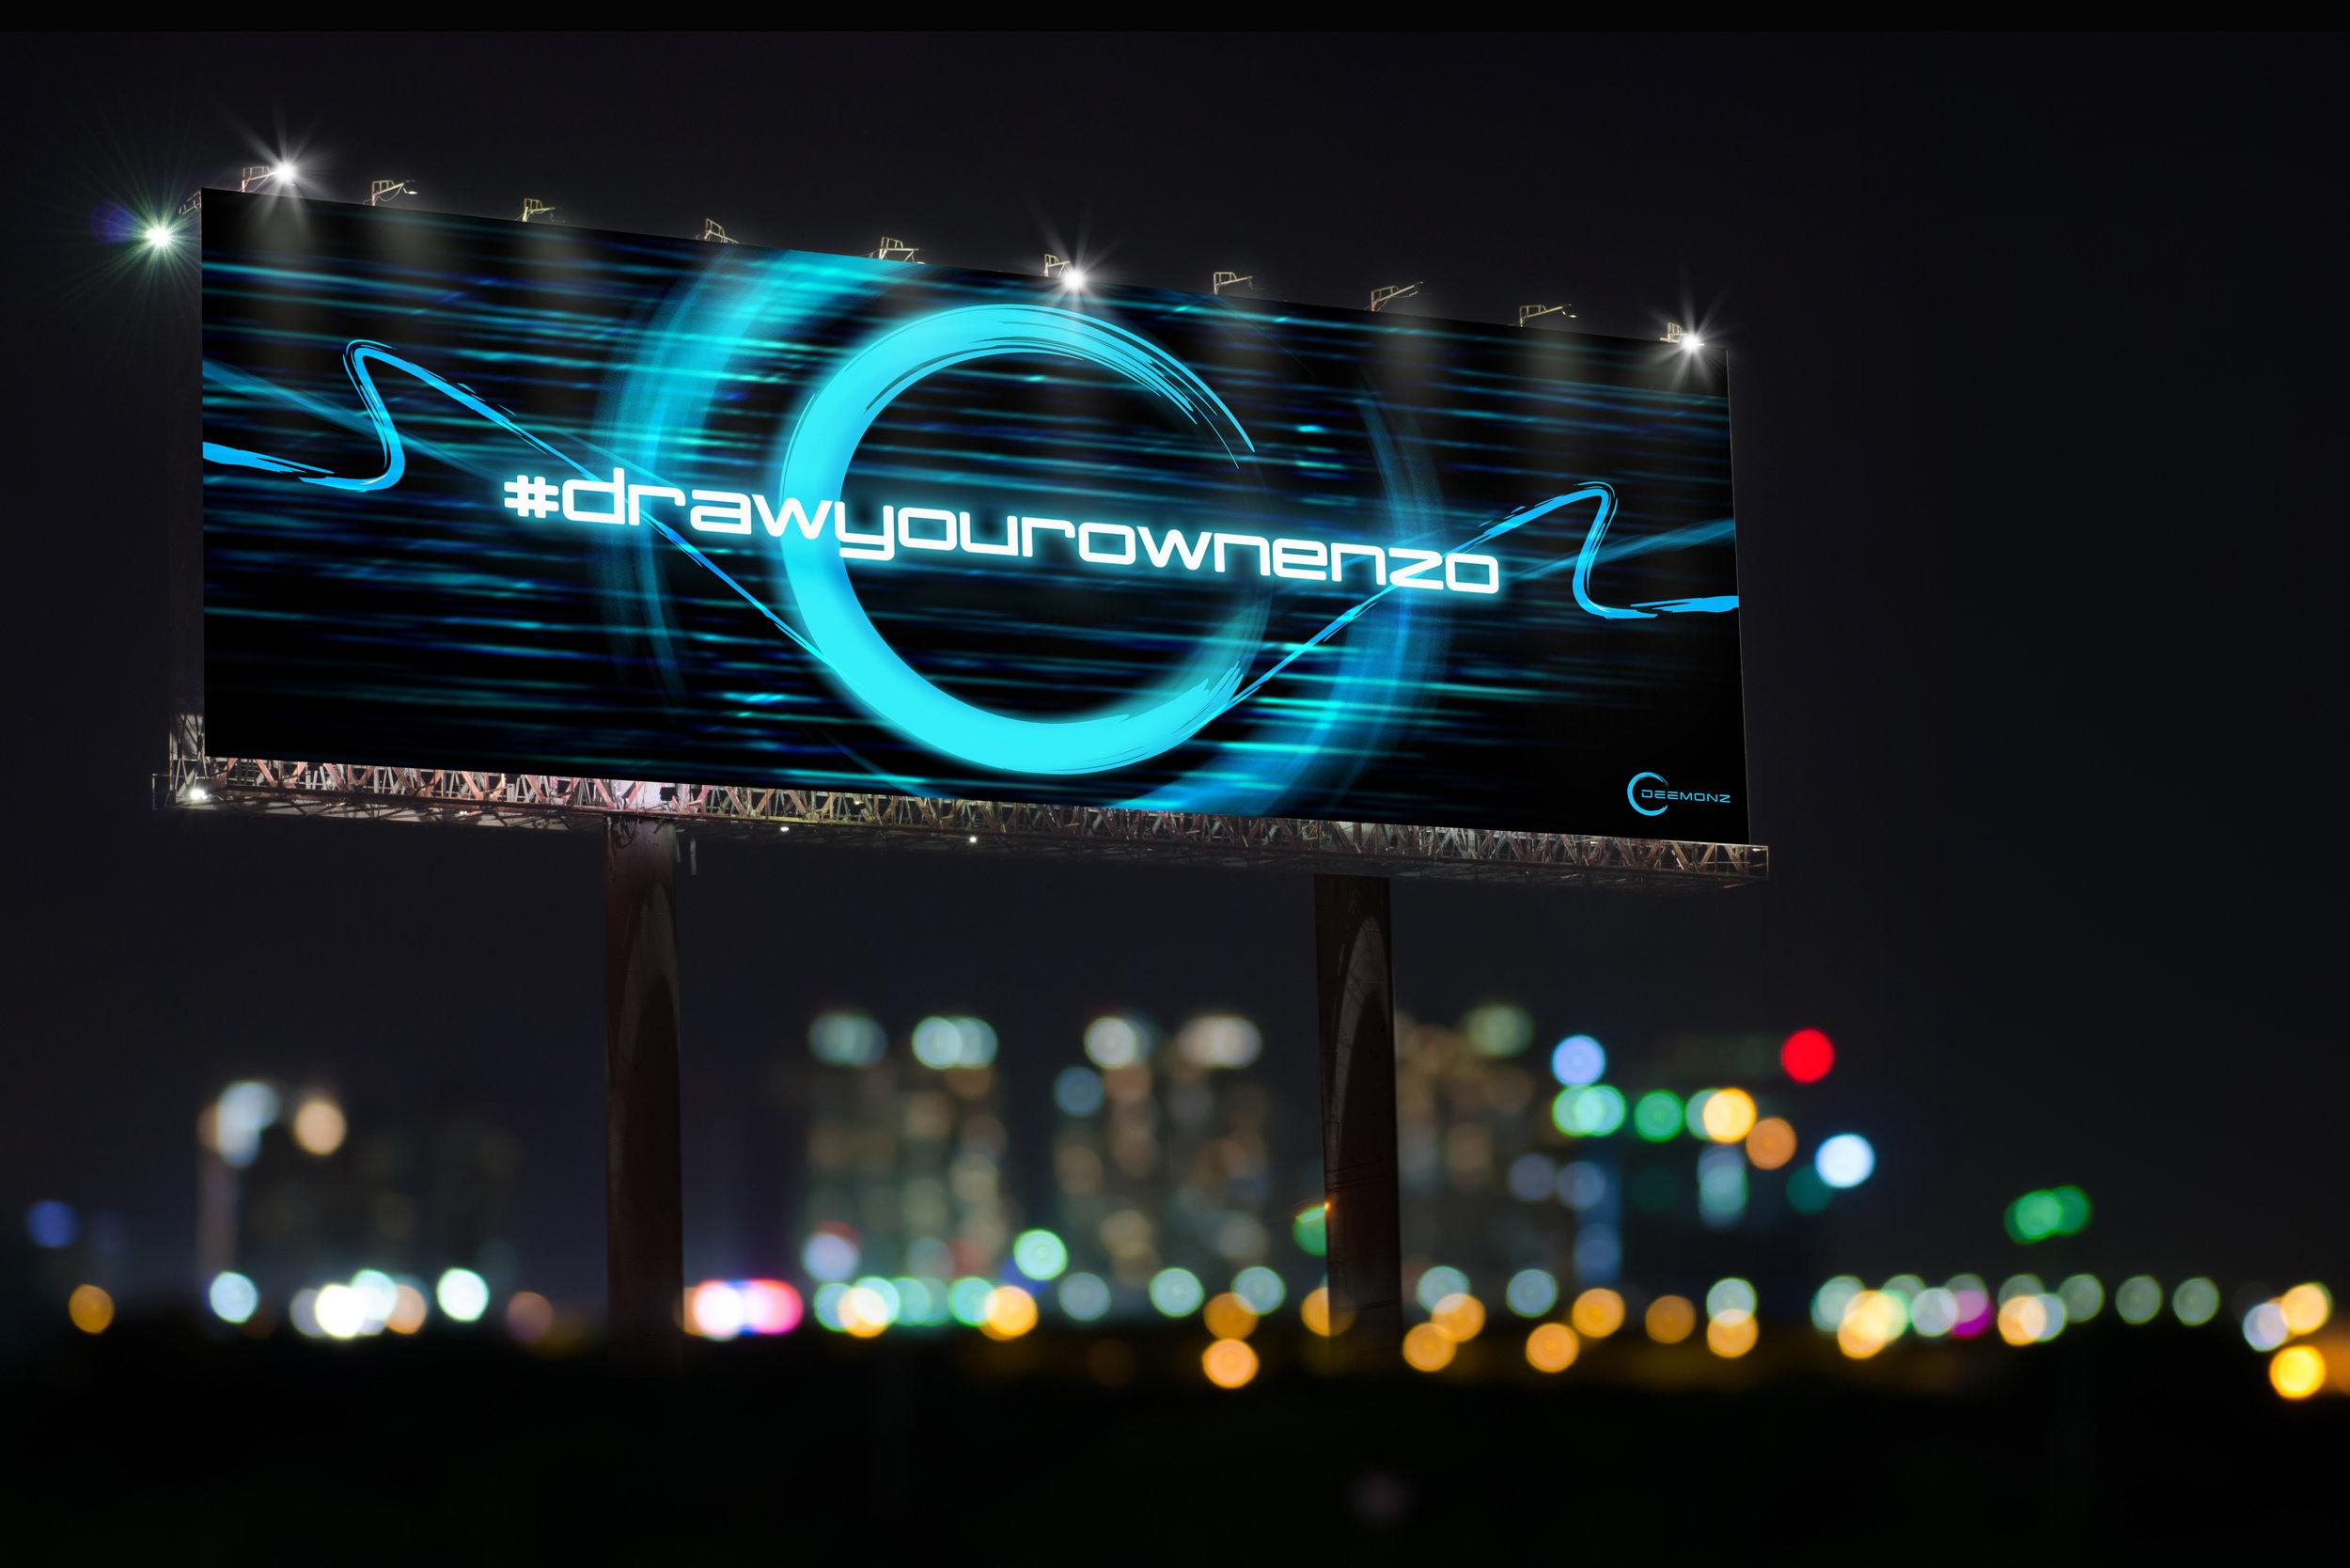 Billboard_enzo4.jpg